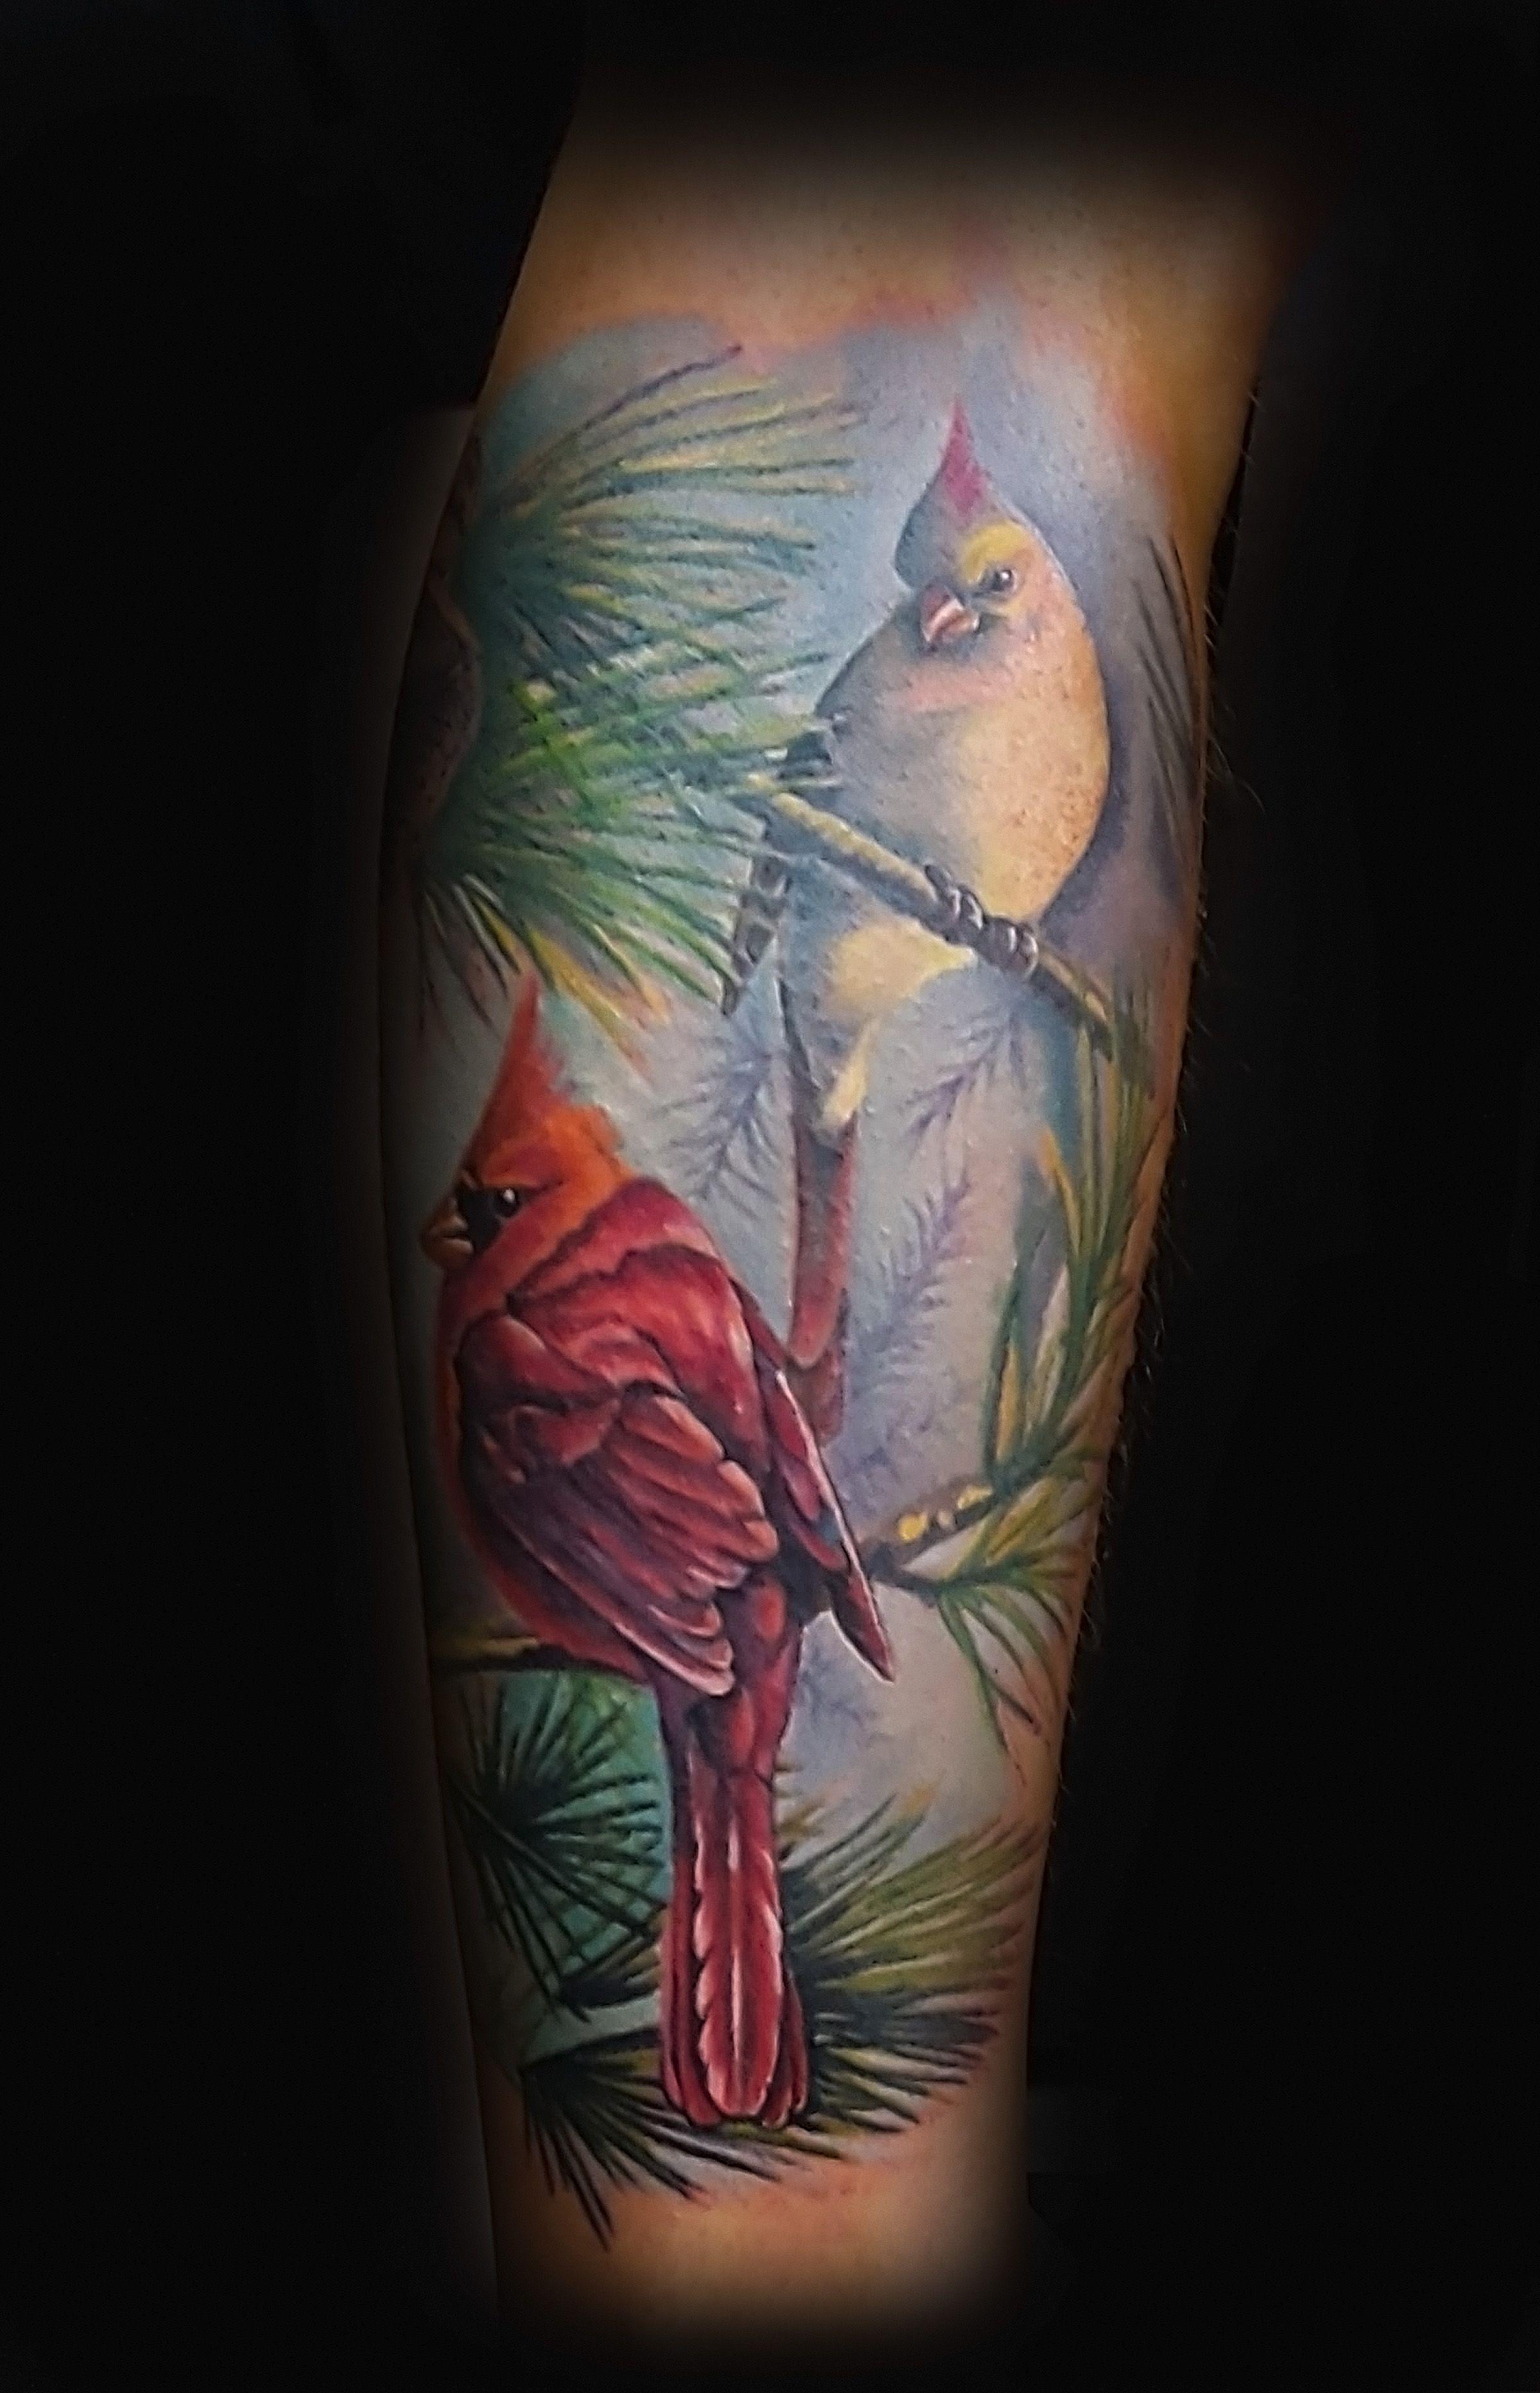 Bird tattoos oklahoma tattoo mike evans tattoos elite